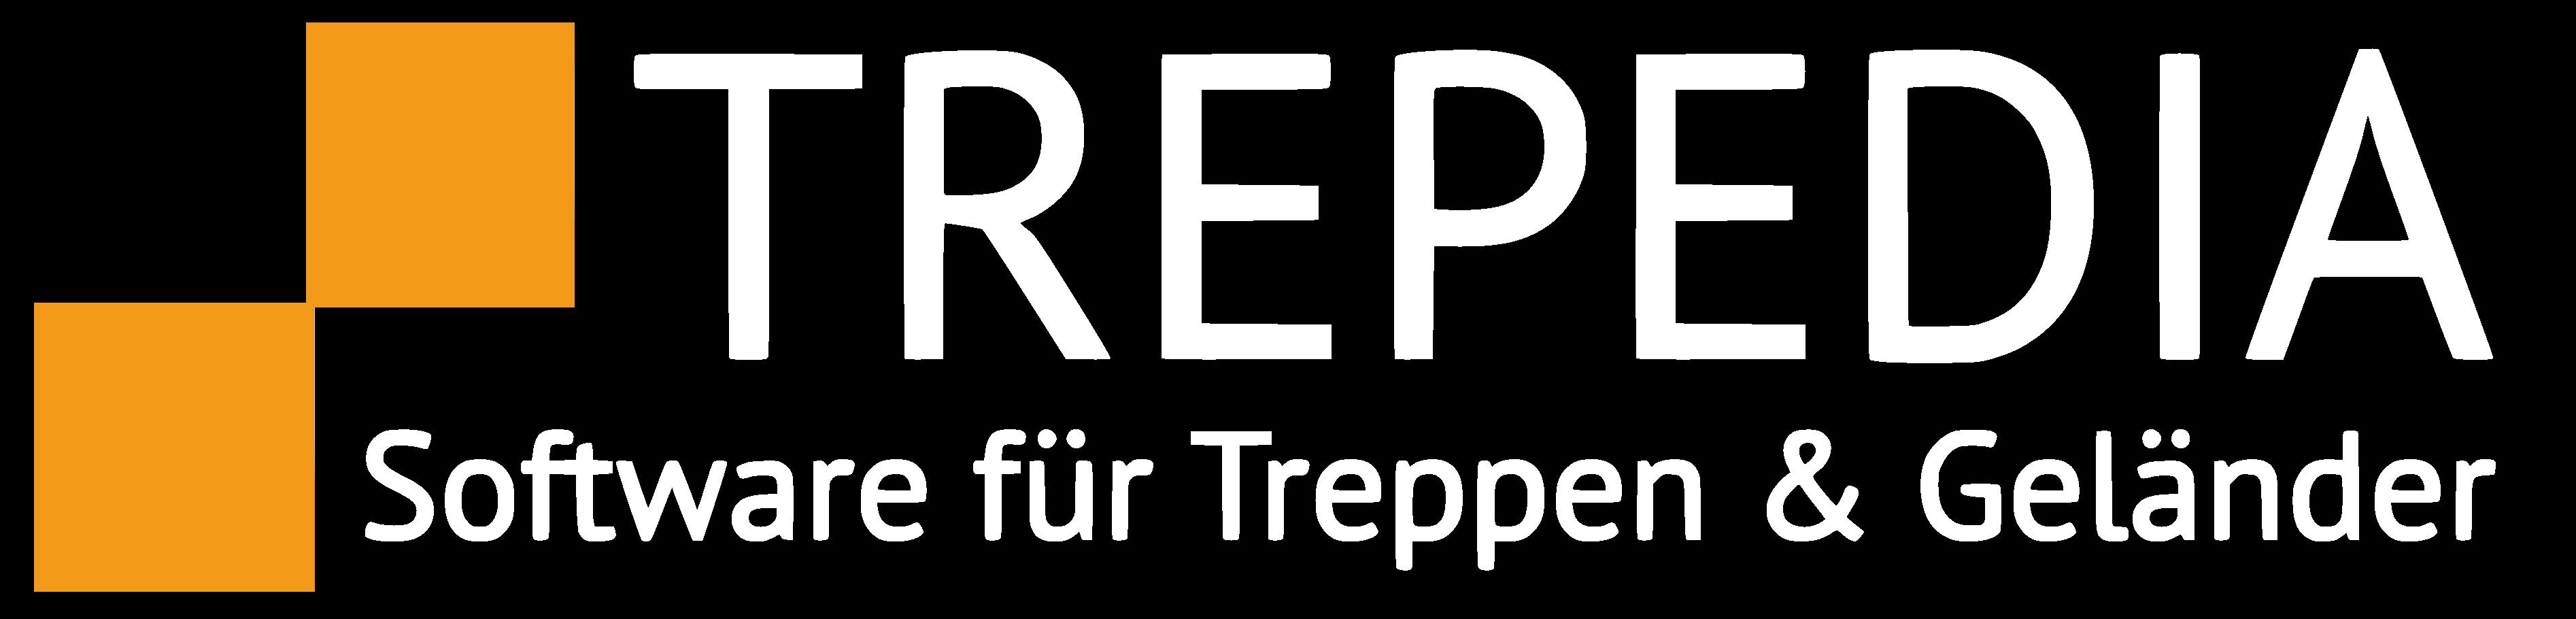 Logo_Trepedia_w.png